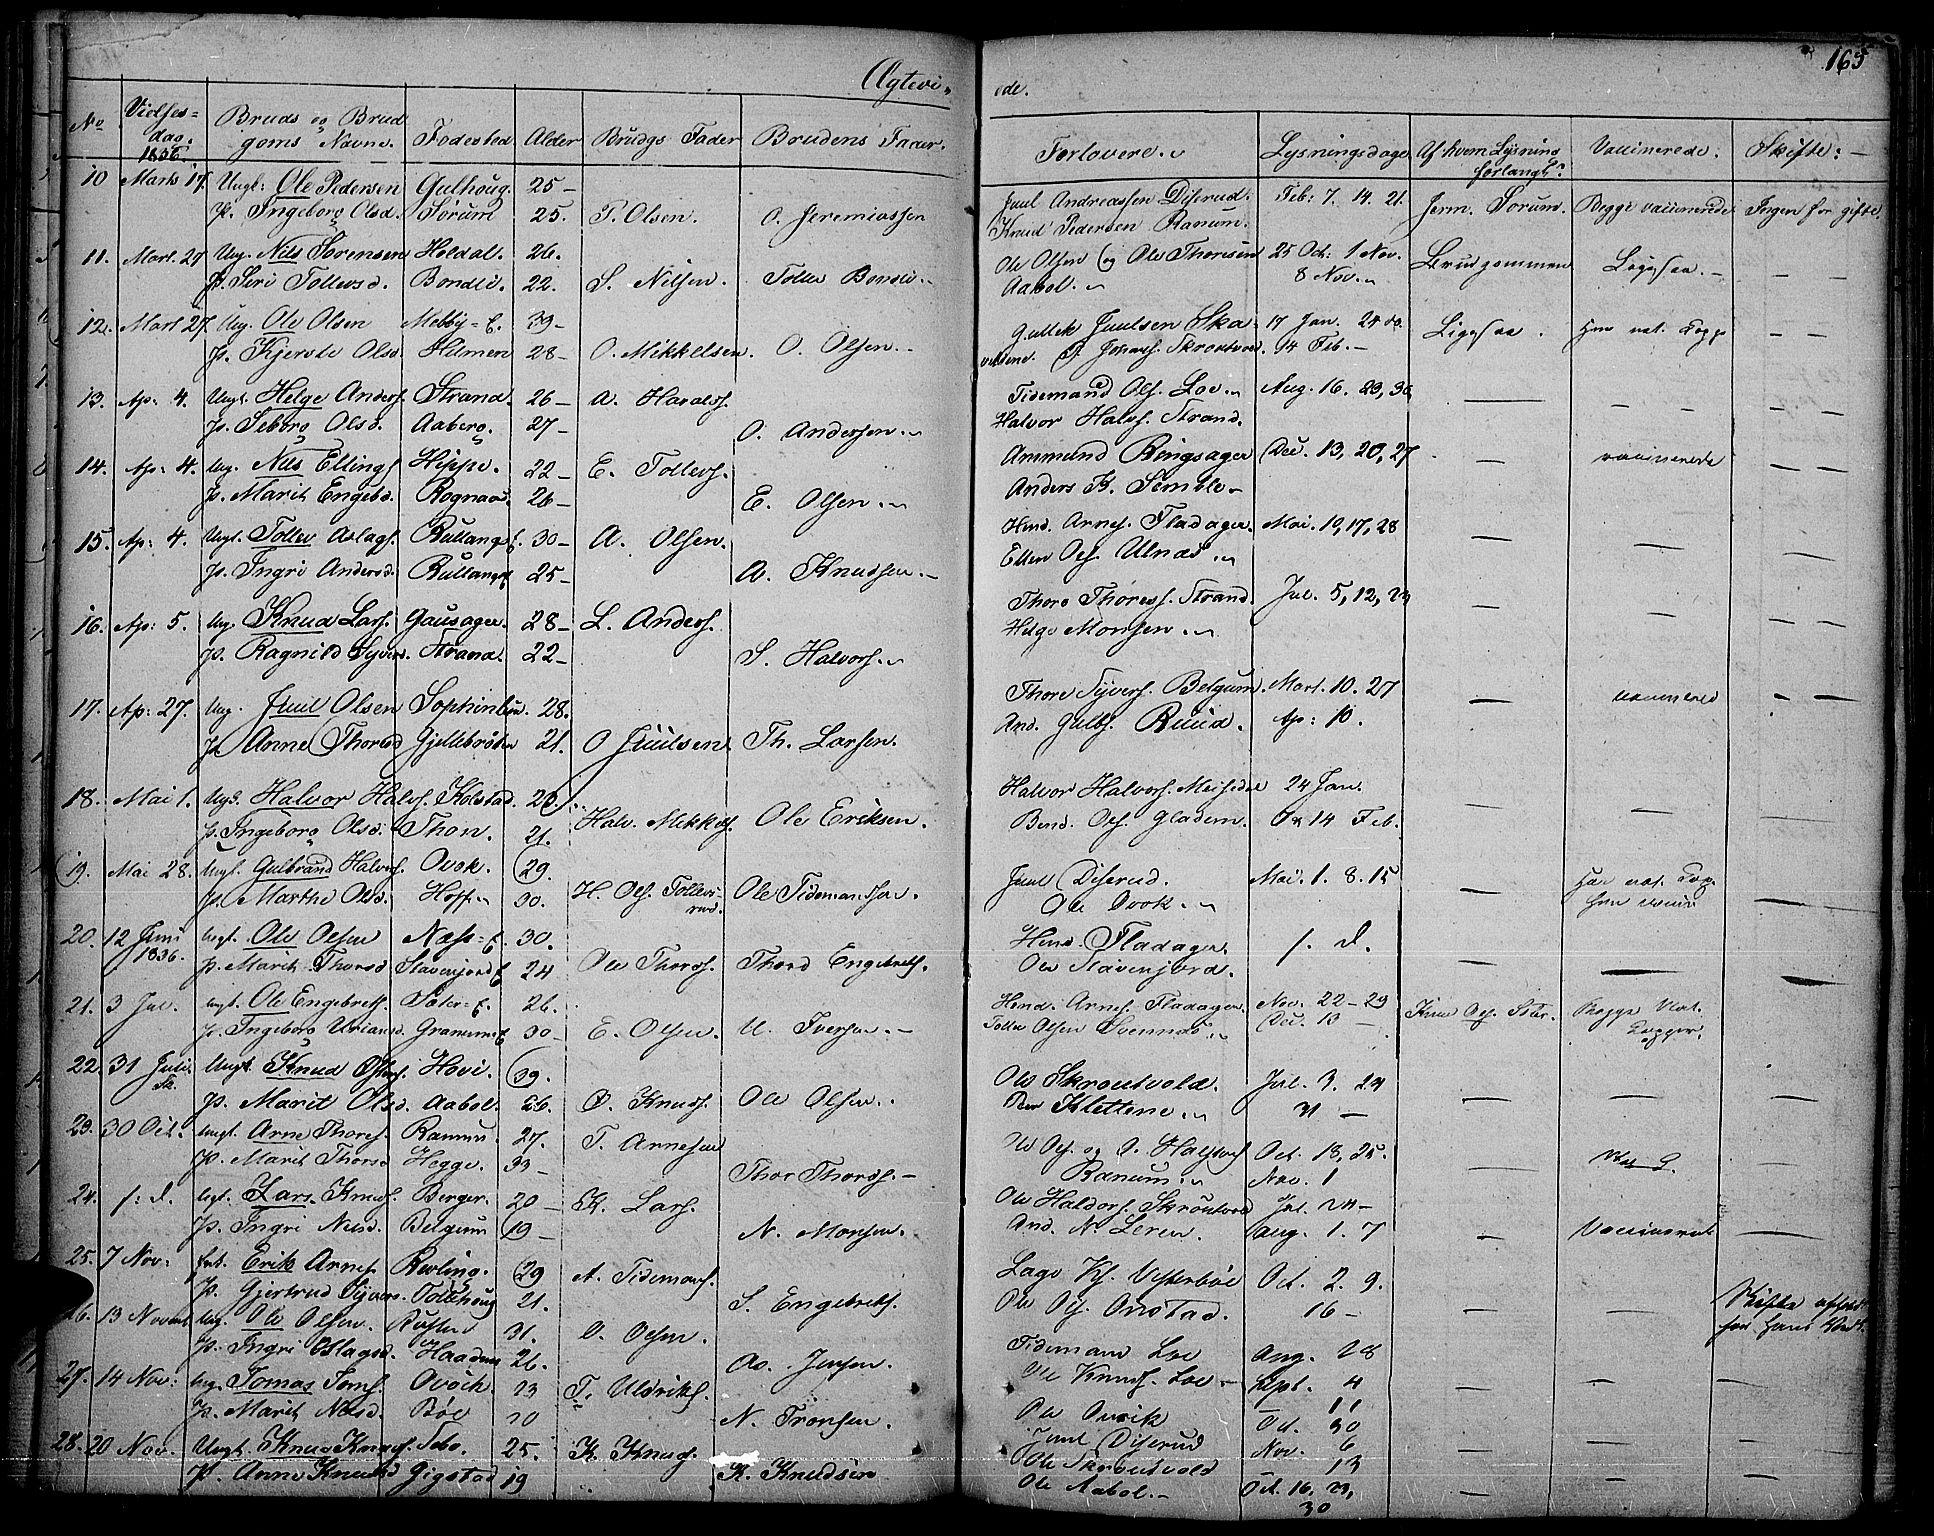 SAH, Nord-Aurdal prestekontor, Ministerialbok nr. 3, 1828-1841, s. 165